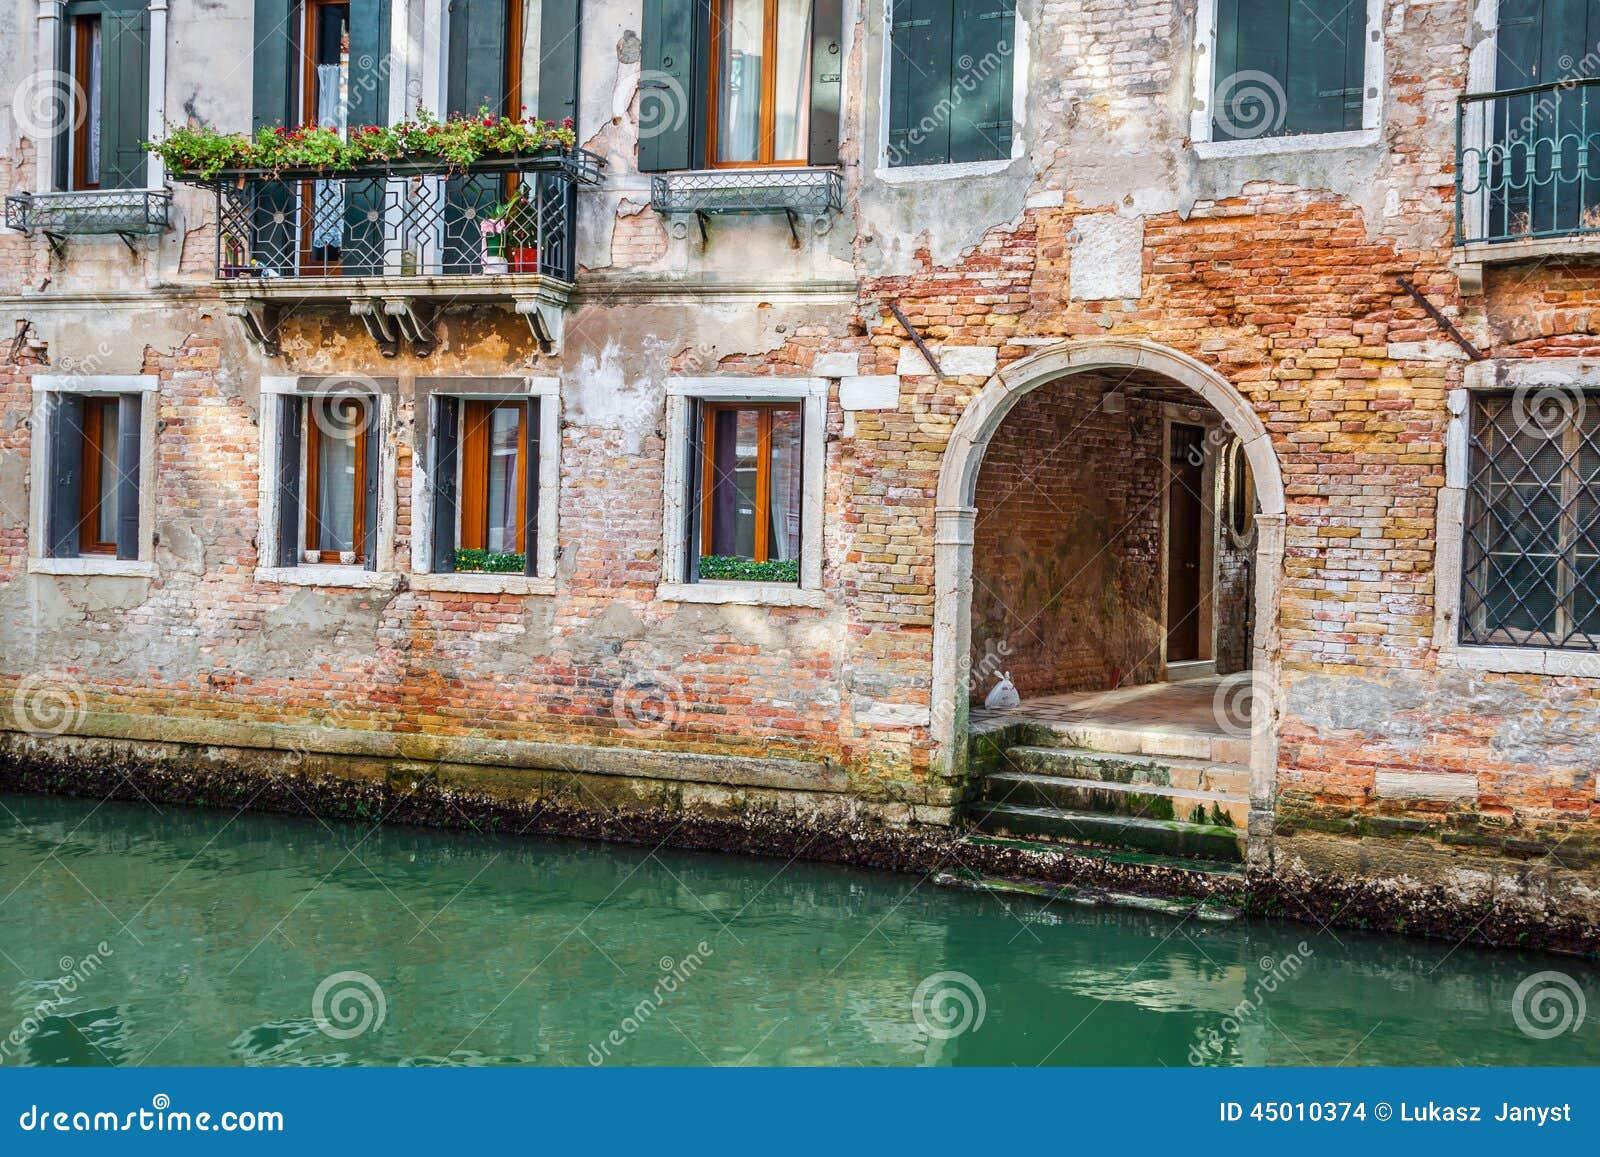 venetian buildings and boats along canal grande venice